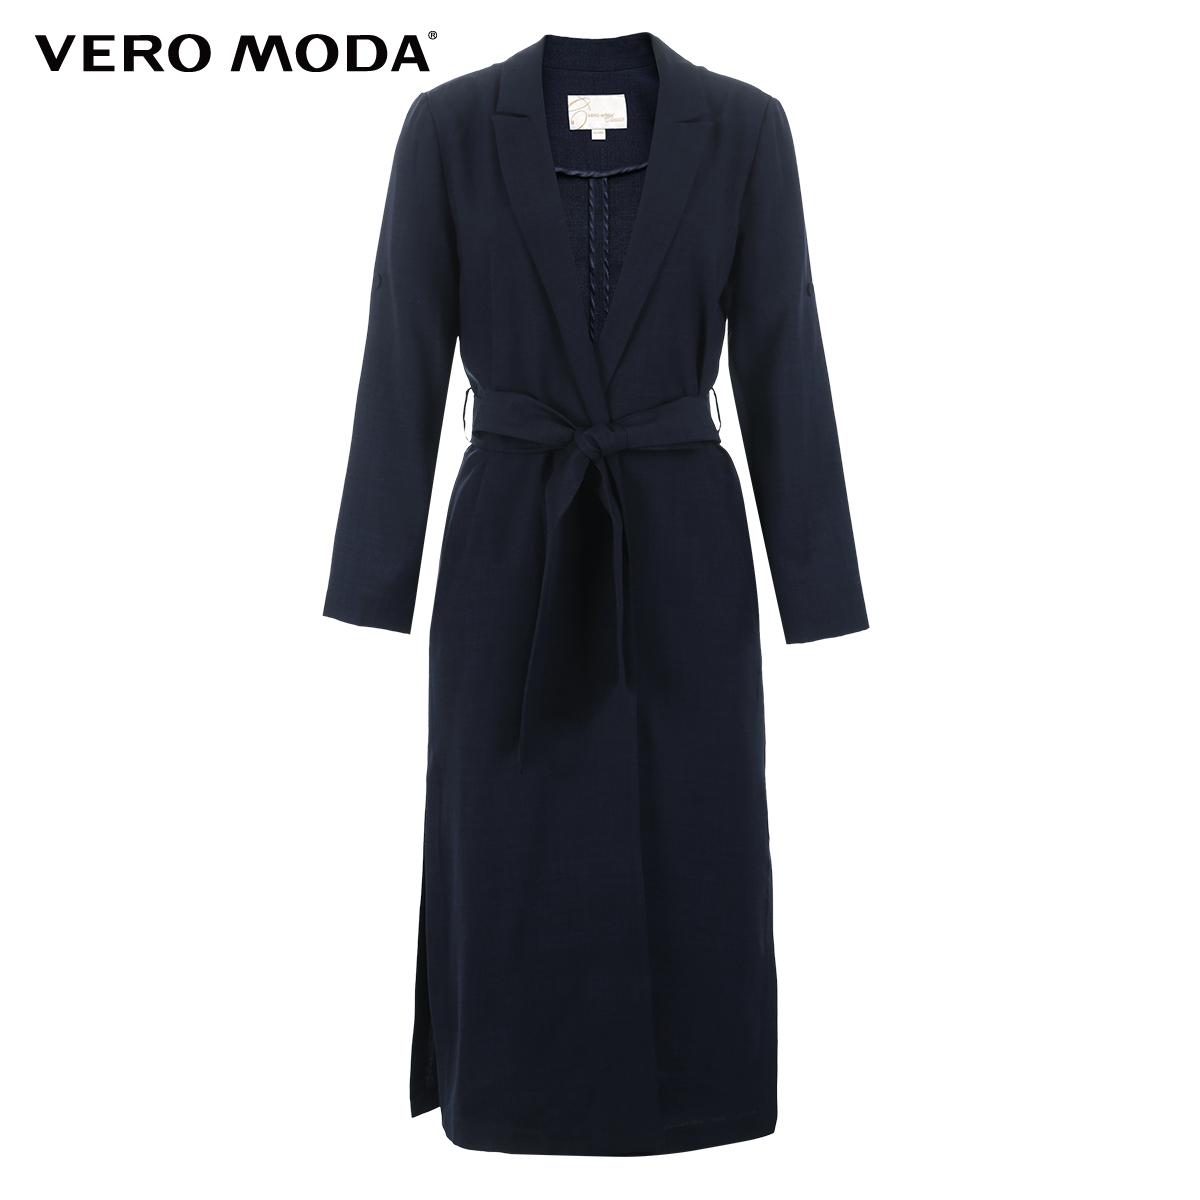 Vero Moda2017新品翻领系带两穿袖中长款风衣外套|317121522